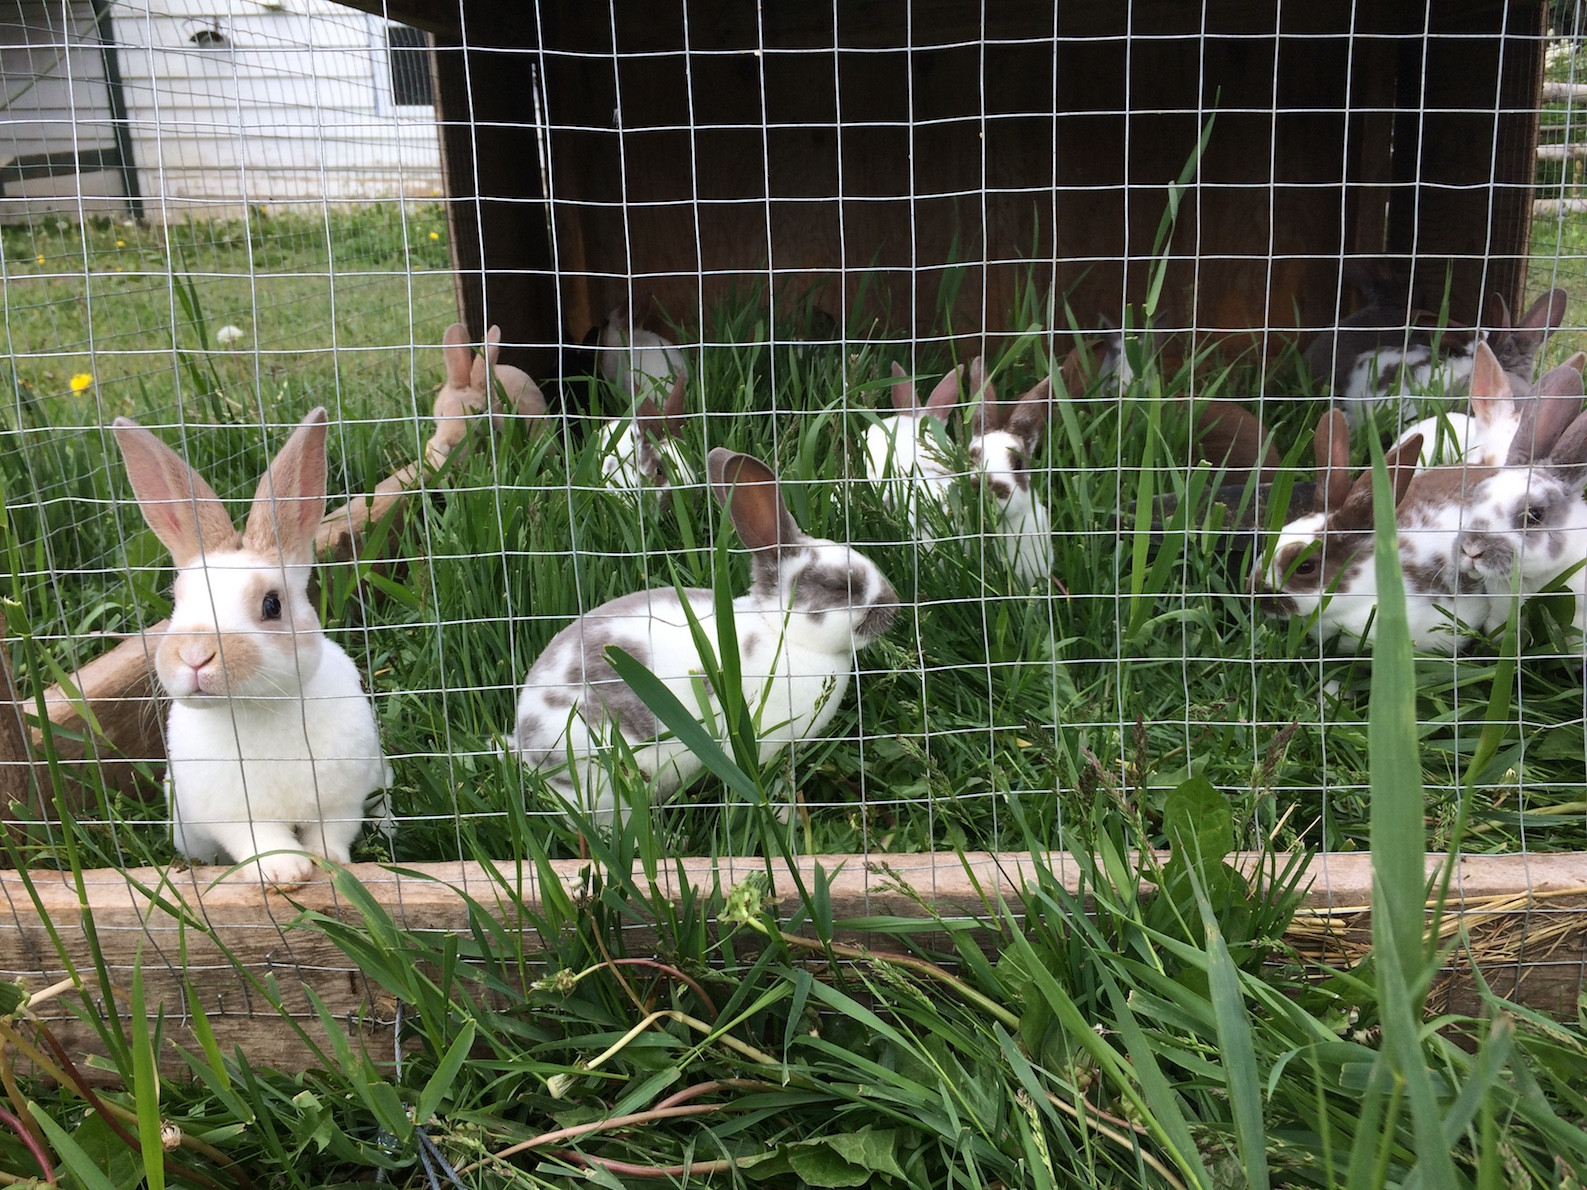 Grass Fed Rabbit